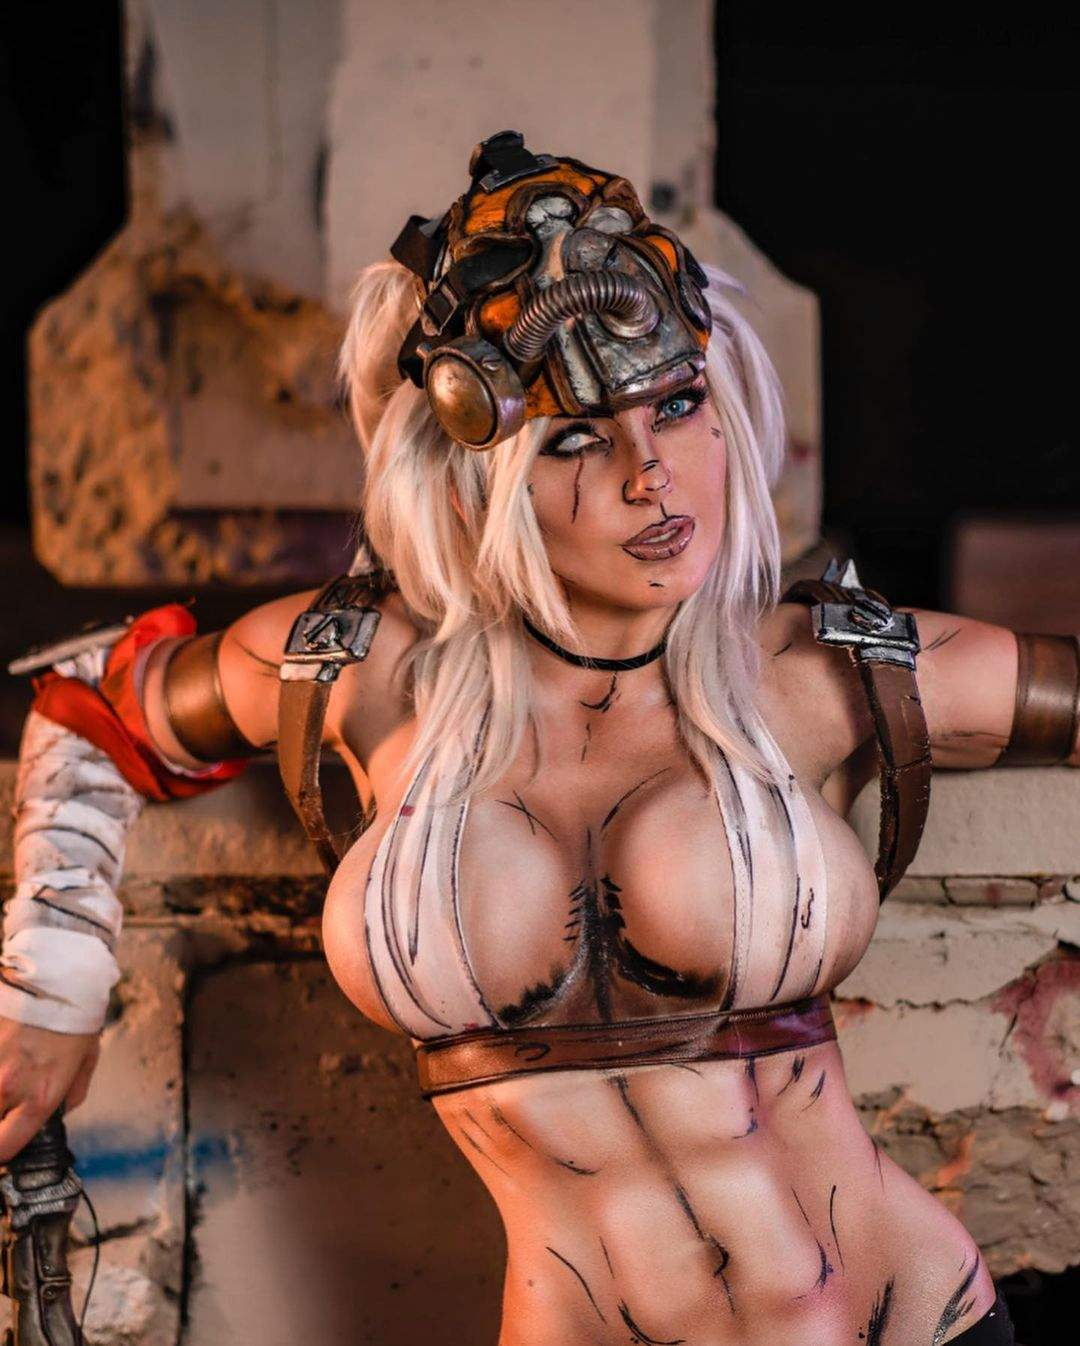 Спокуслива жіноча версія: американська модель показала косплей на Крига з Borderlands 2